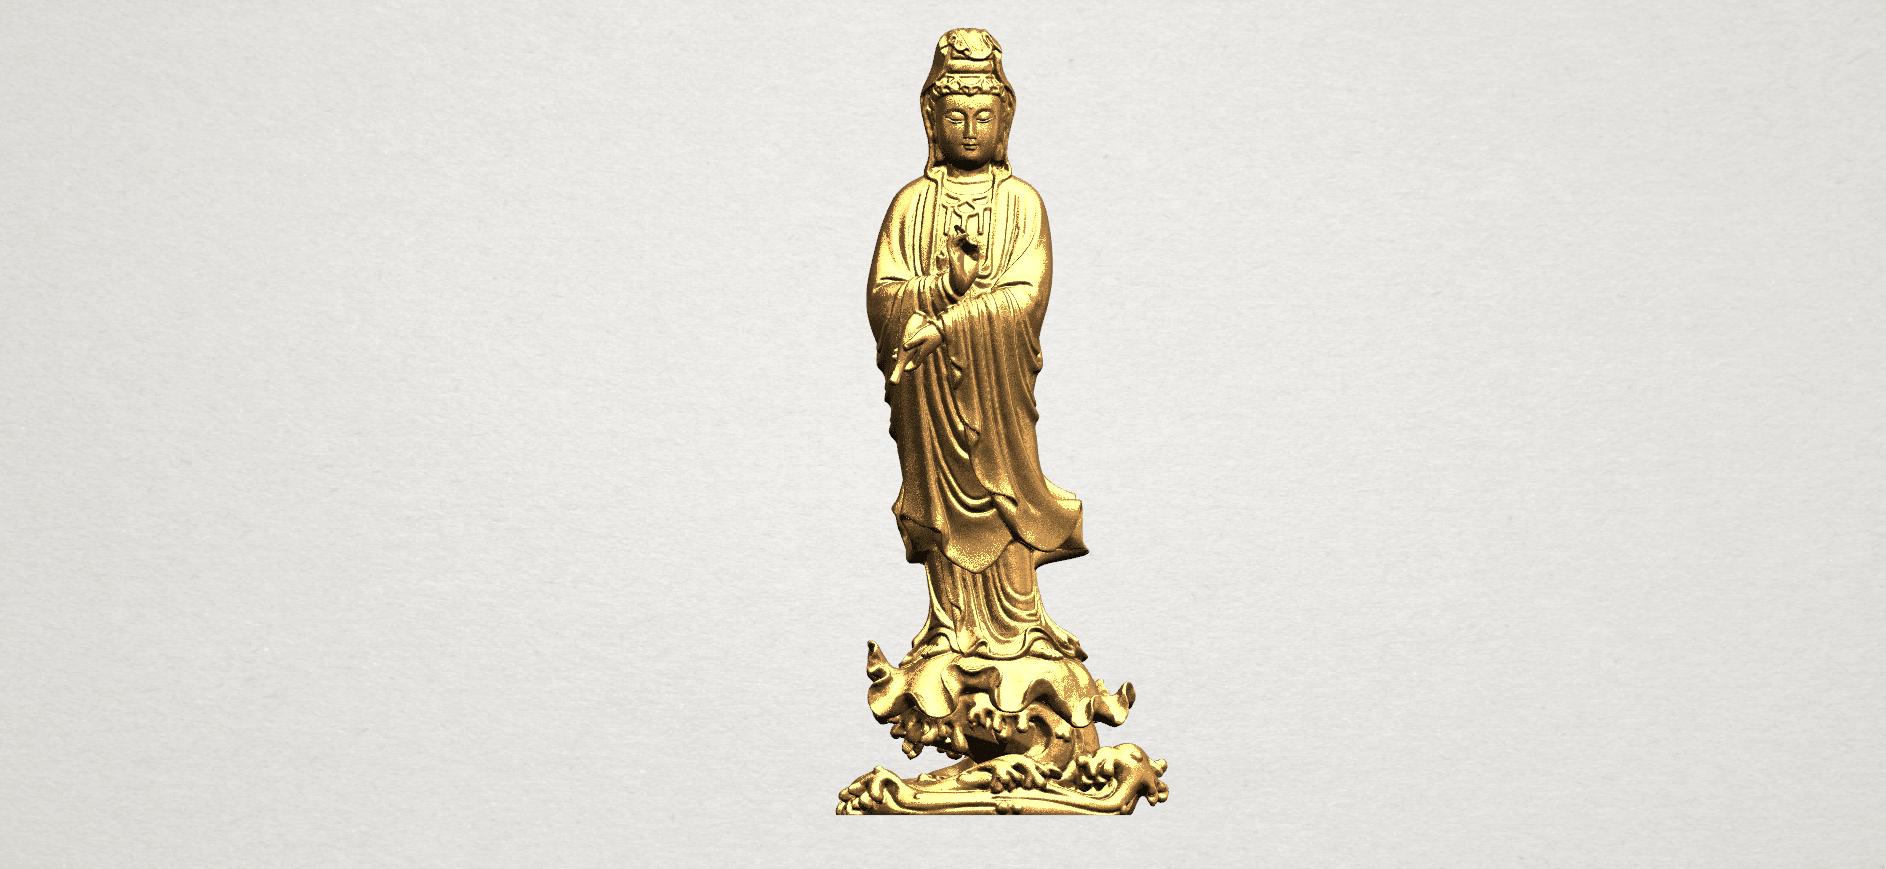 Avalokitesvara Buddha - Standing (v) A01.png Download free STL file Avalokitesvara Buddha - Standing 05 • 3D printer template, GeorgesNikkei